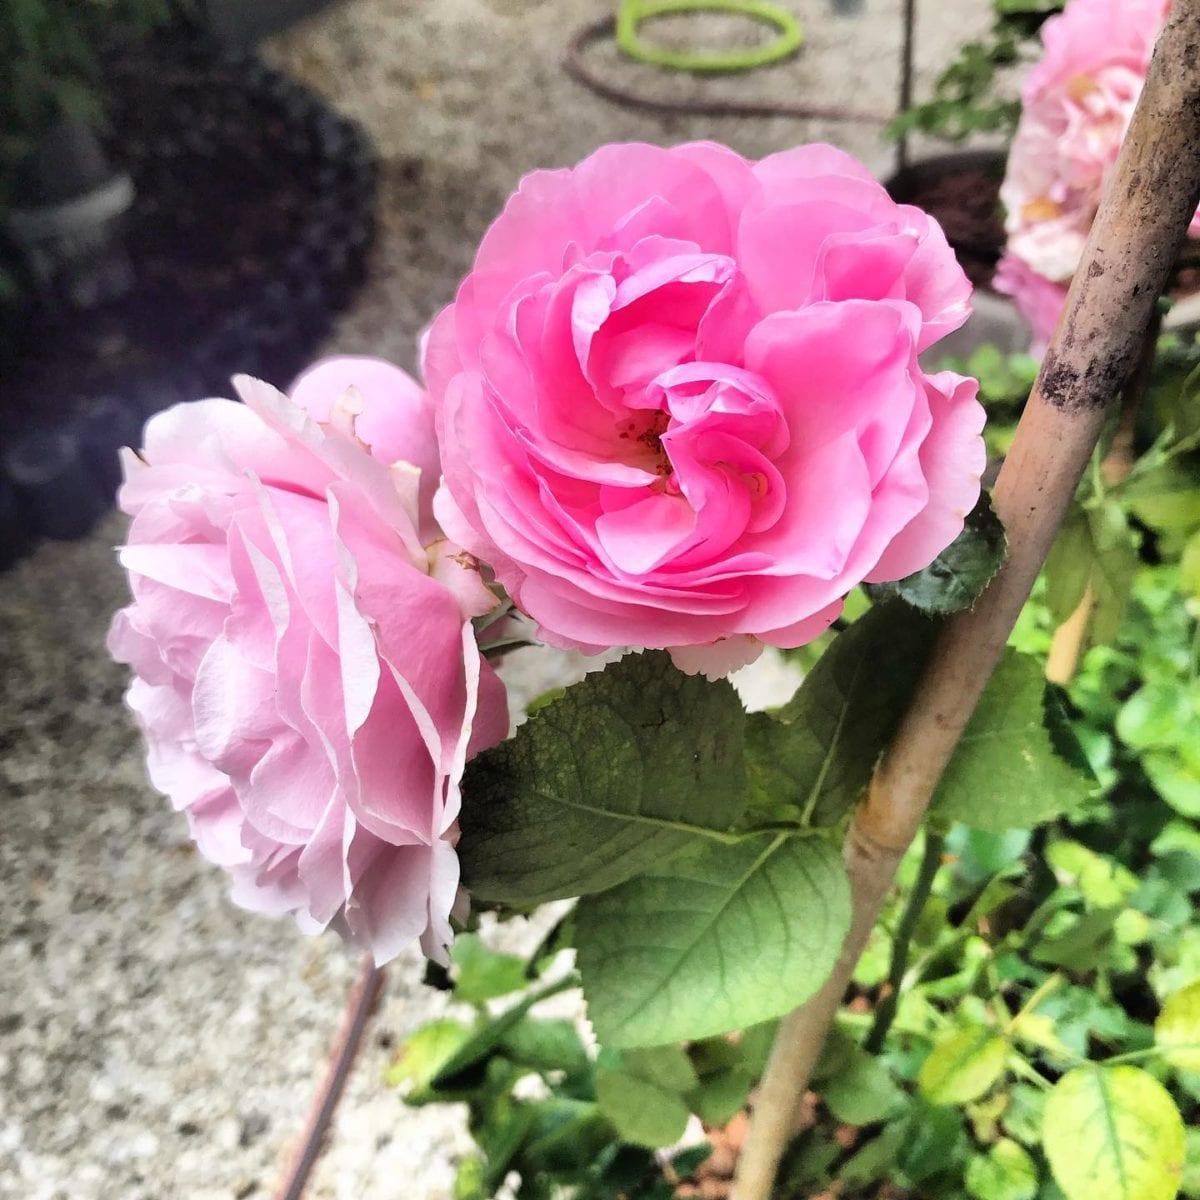 Les roses du petit jardin  🌳🌞 ️ @mairie18